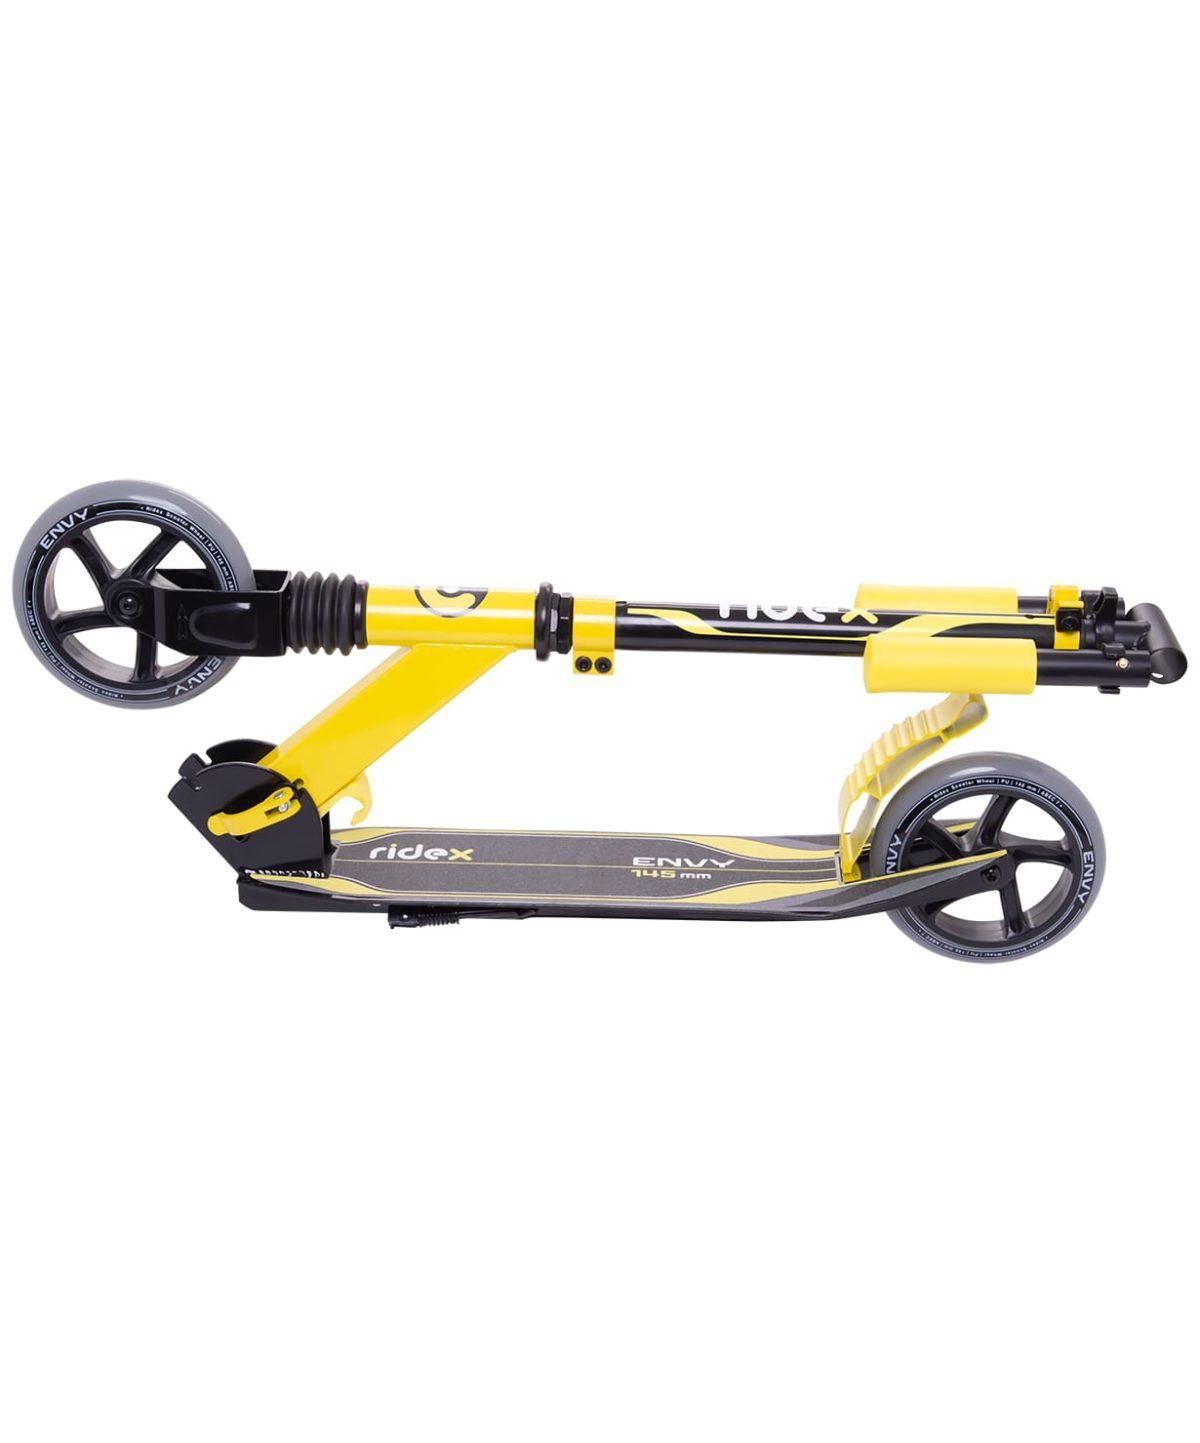 RIDEX Envy Самокат 2-колесный  145 мм  Envy: жёлтый - 6